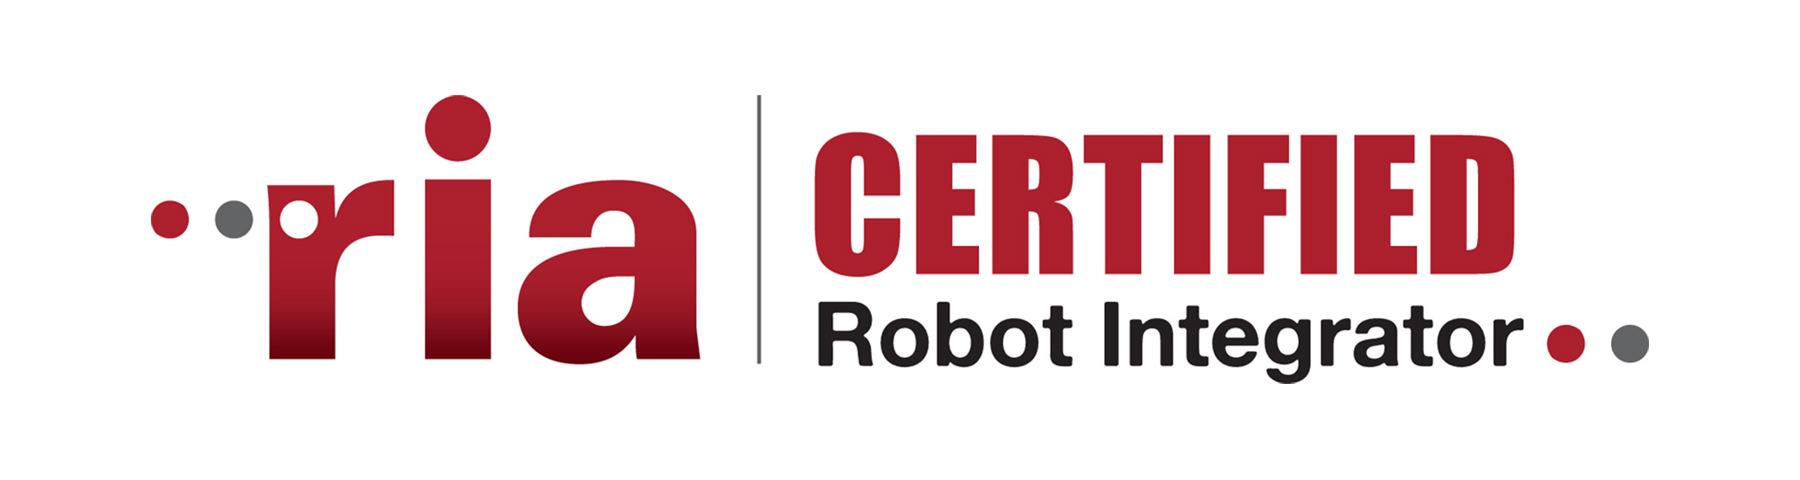 Integrador de robots certificado por RIA